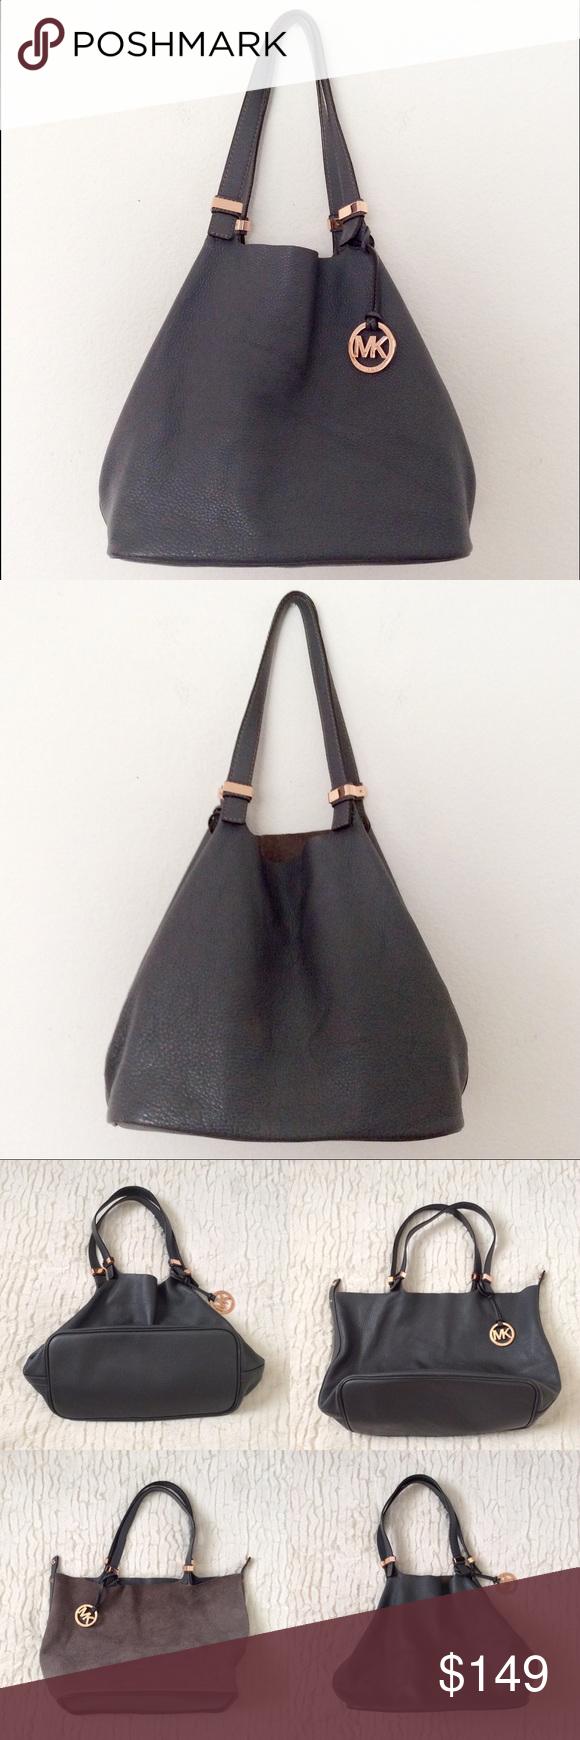 cf4894969e3e MK Colgate Reversible Tote Bag 💯Authentic MK Michael Kors Colgate  Reversible Pebbled Leather Tote Bag